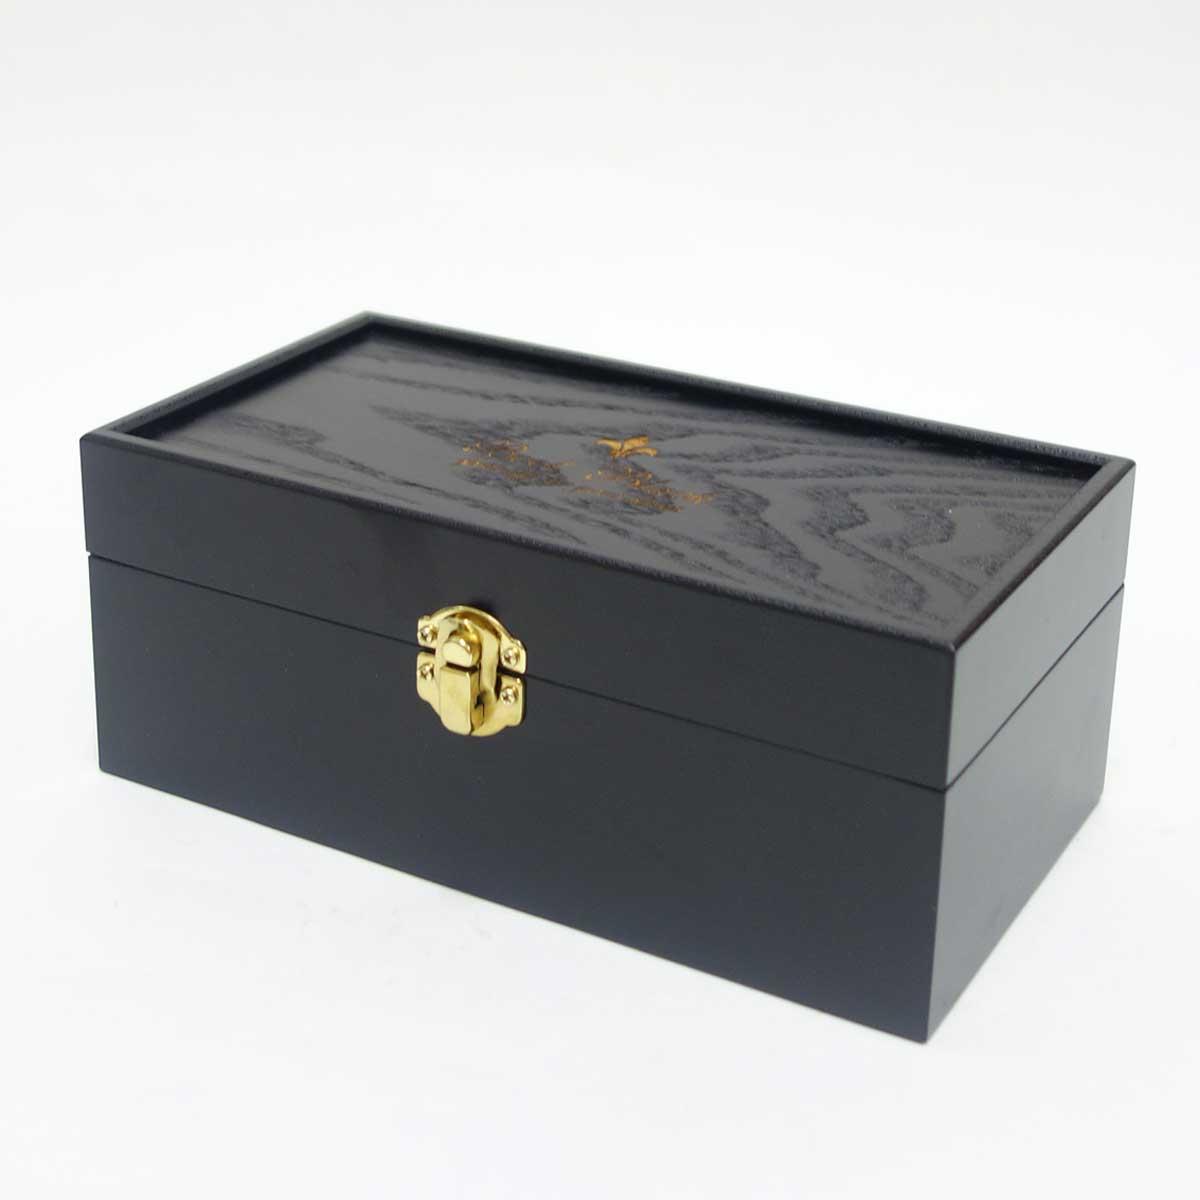 Boot Black ブートブラック 磨きのプロ達が創り上げたシューケアBOXスプモーニ(木箱のみ)(日本製)コロンブス《Boot Black》正規取扱店